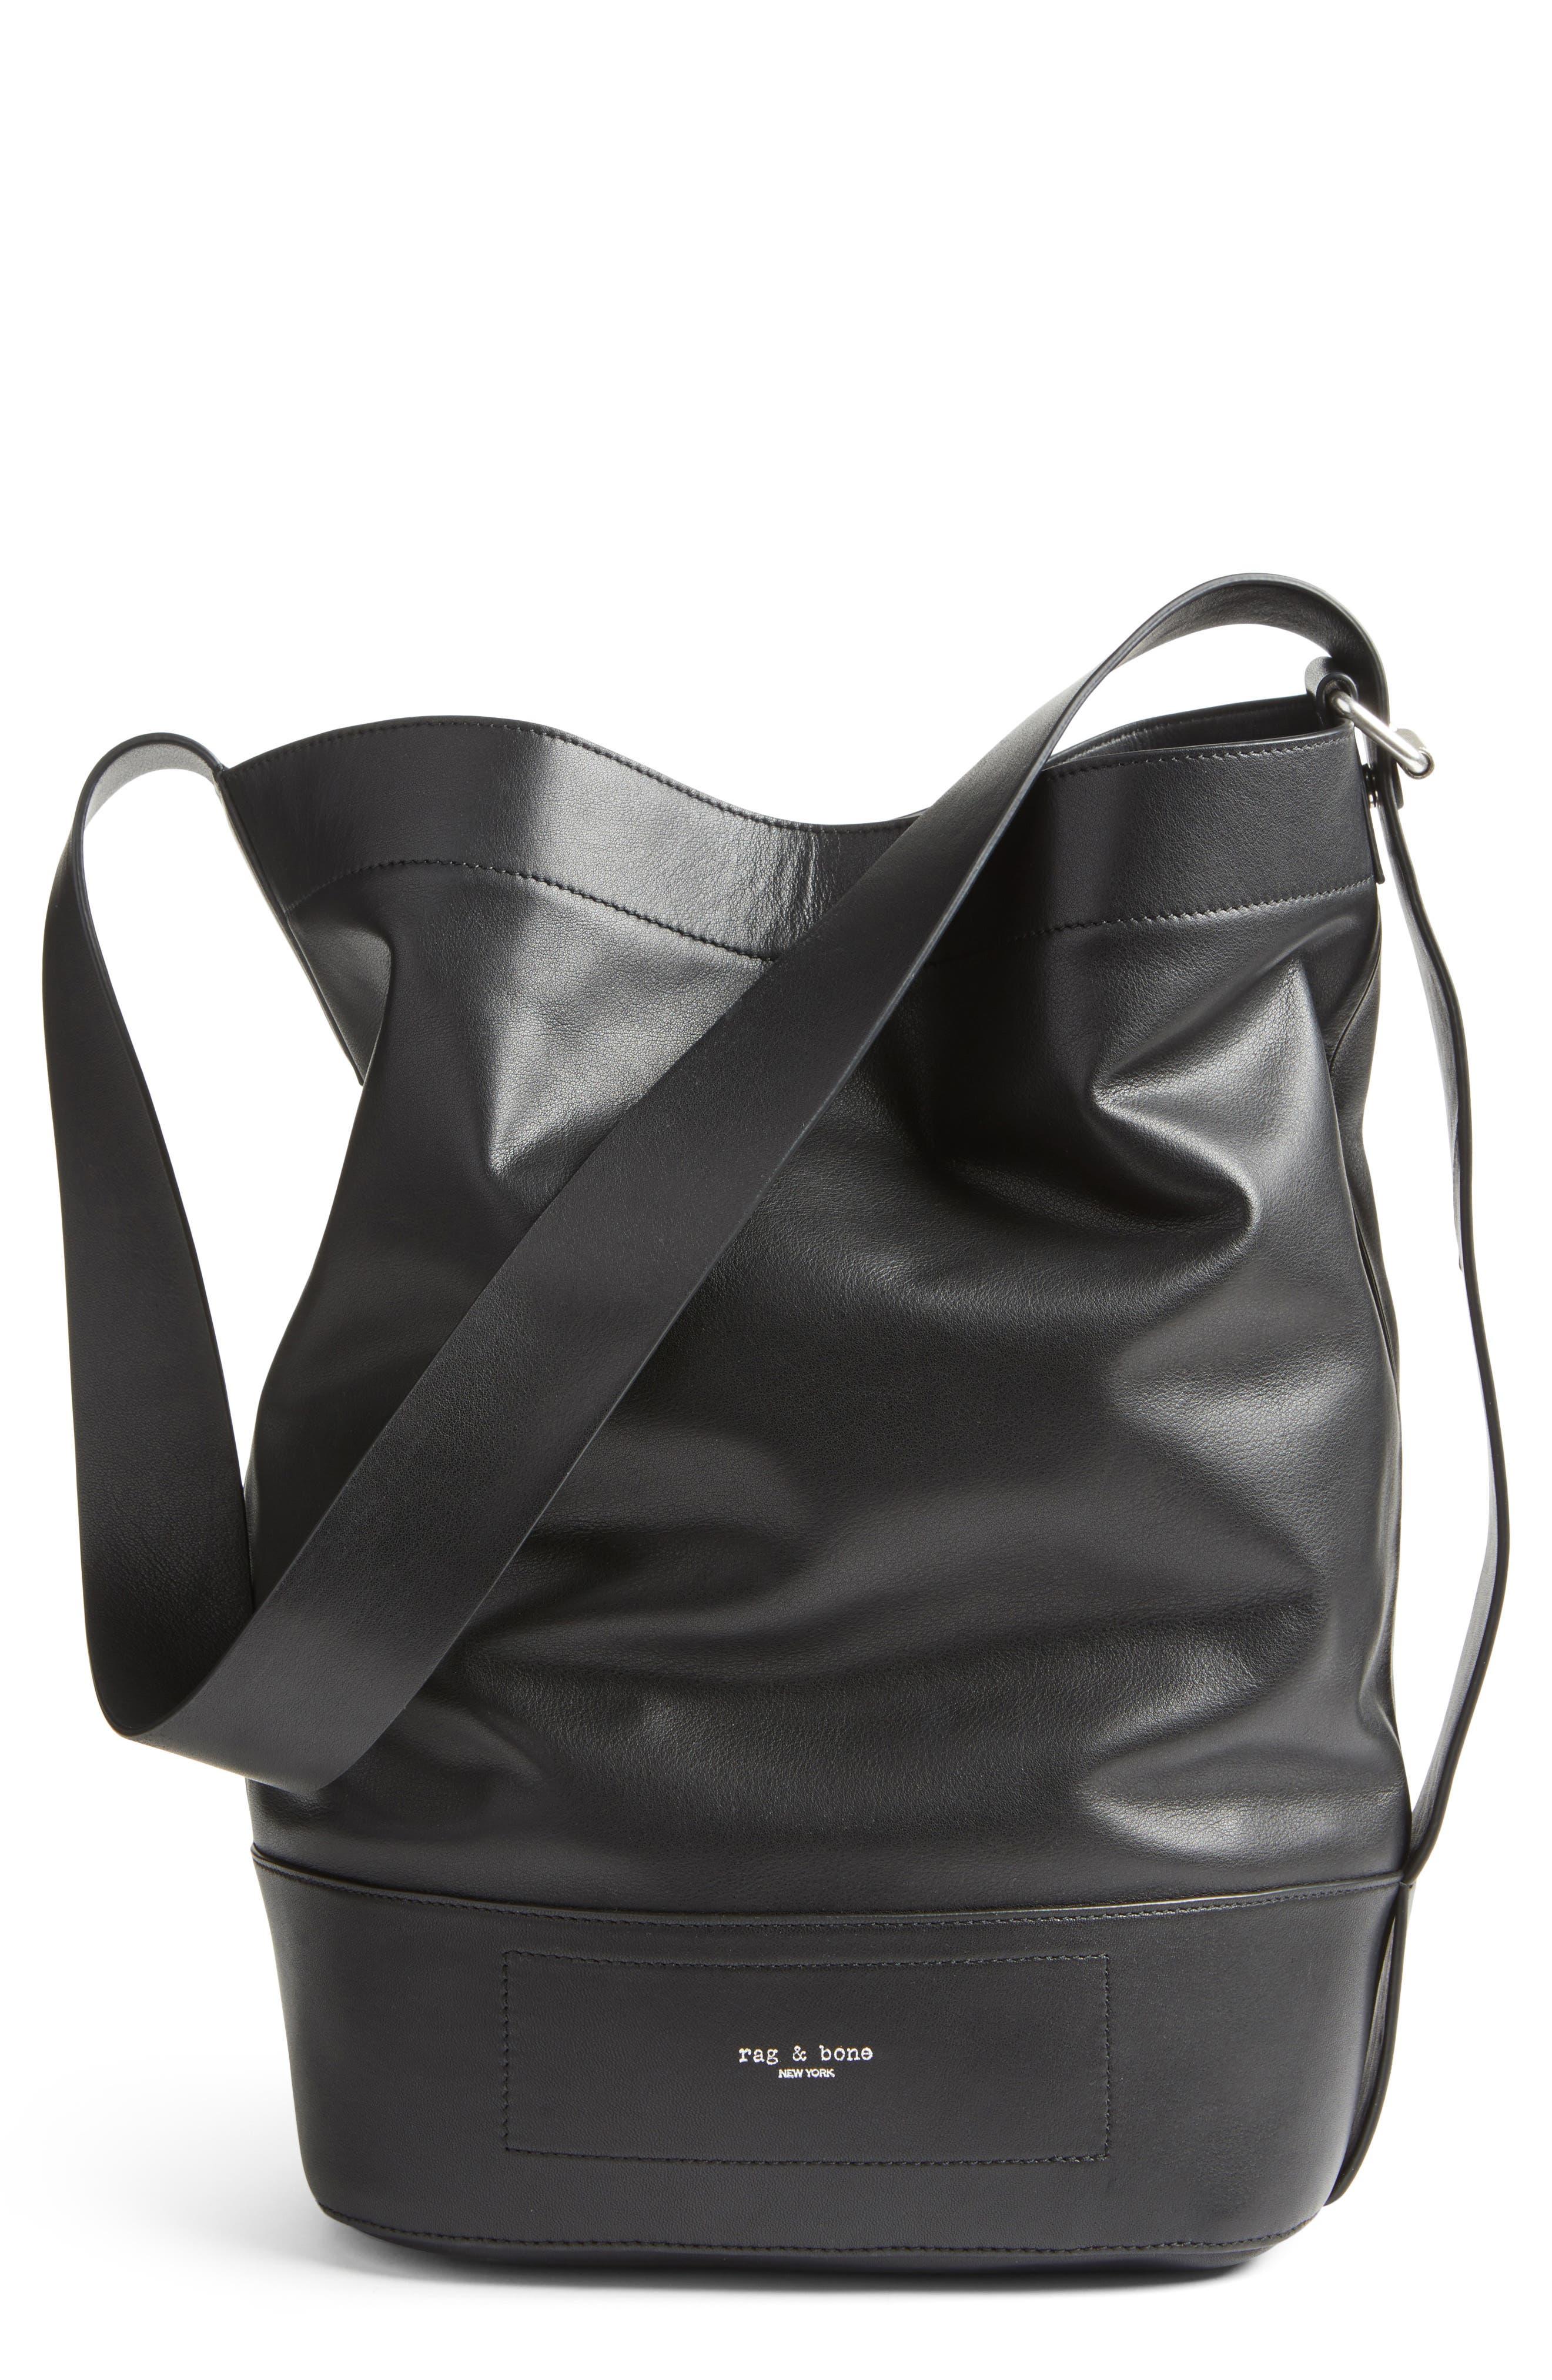 Main Image - rag & bone Walker Sling Leather Bucket Bag